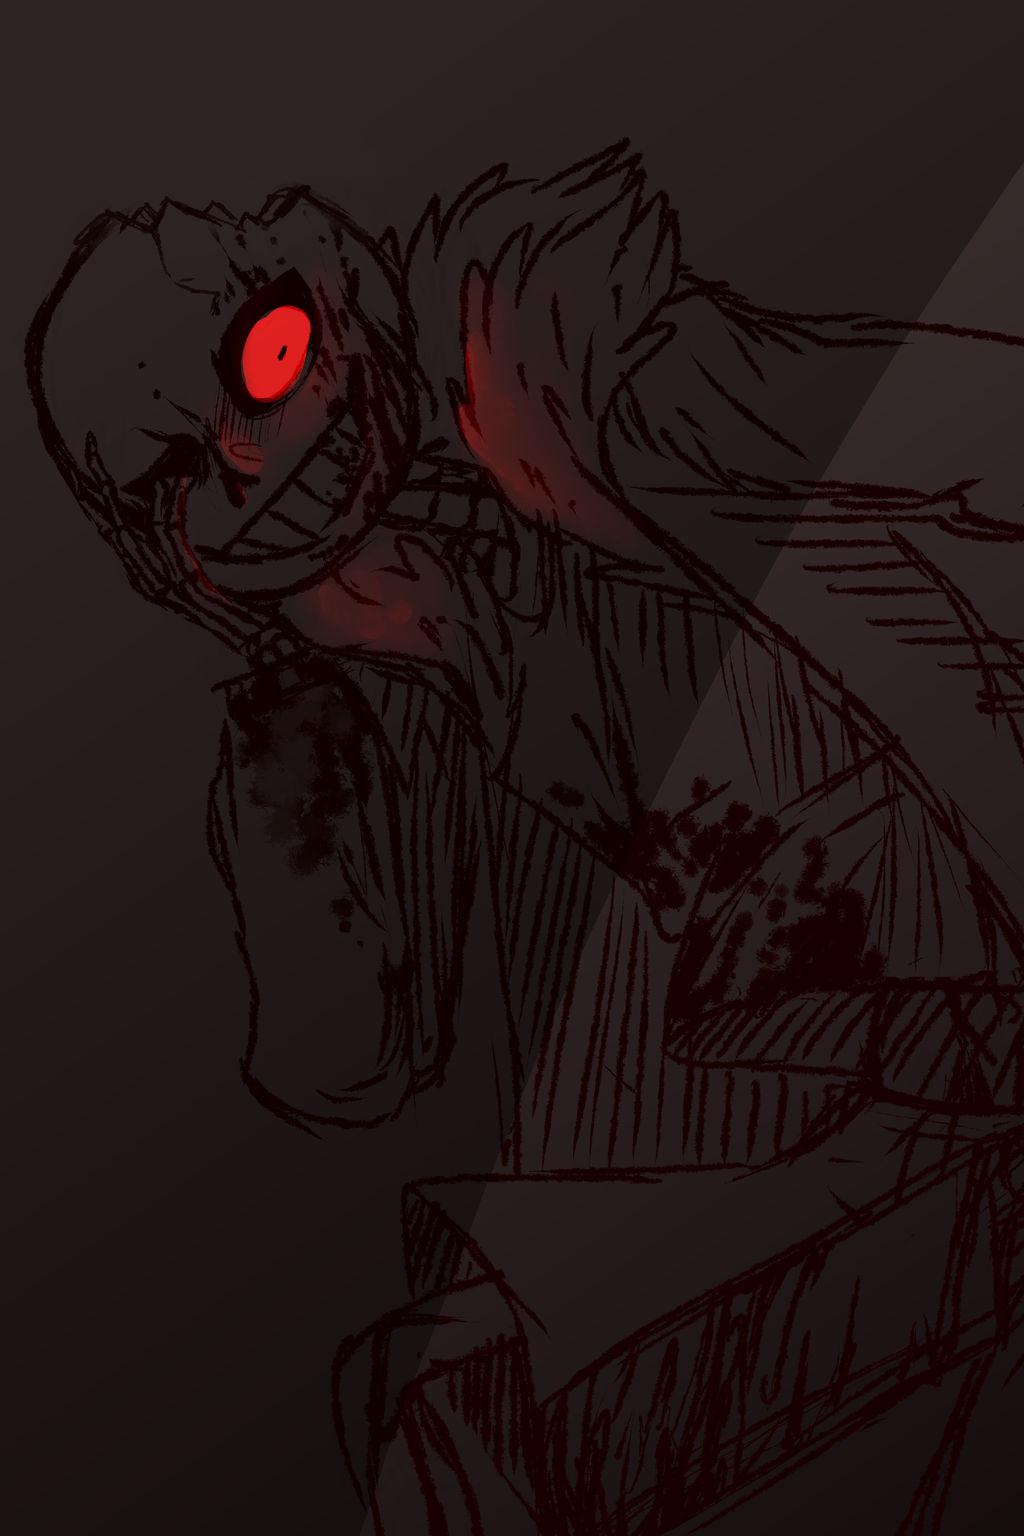 Spooktober: Day 3 by MirageComet